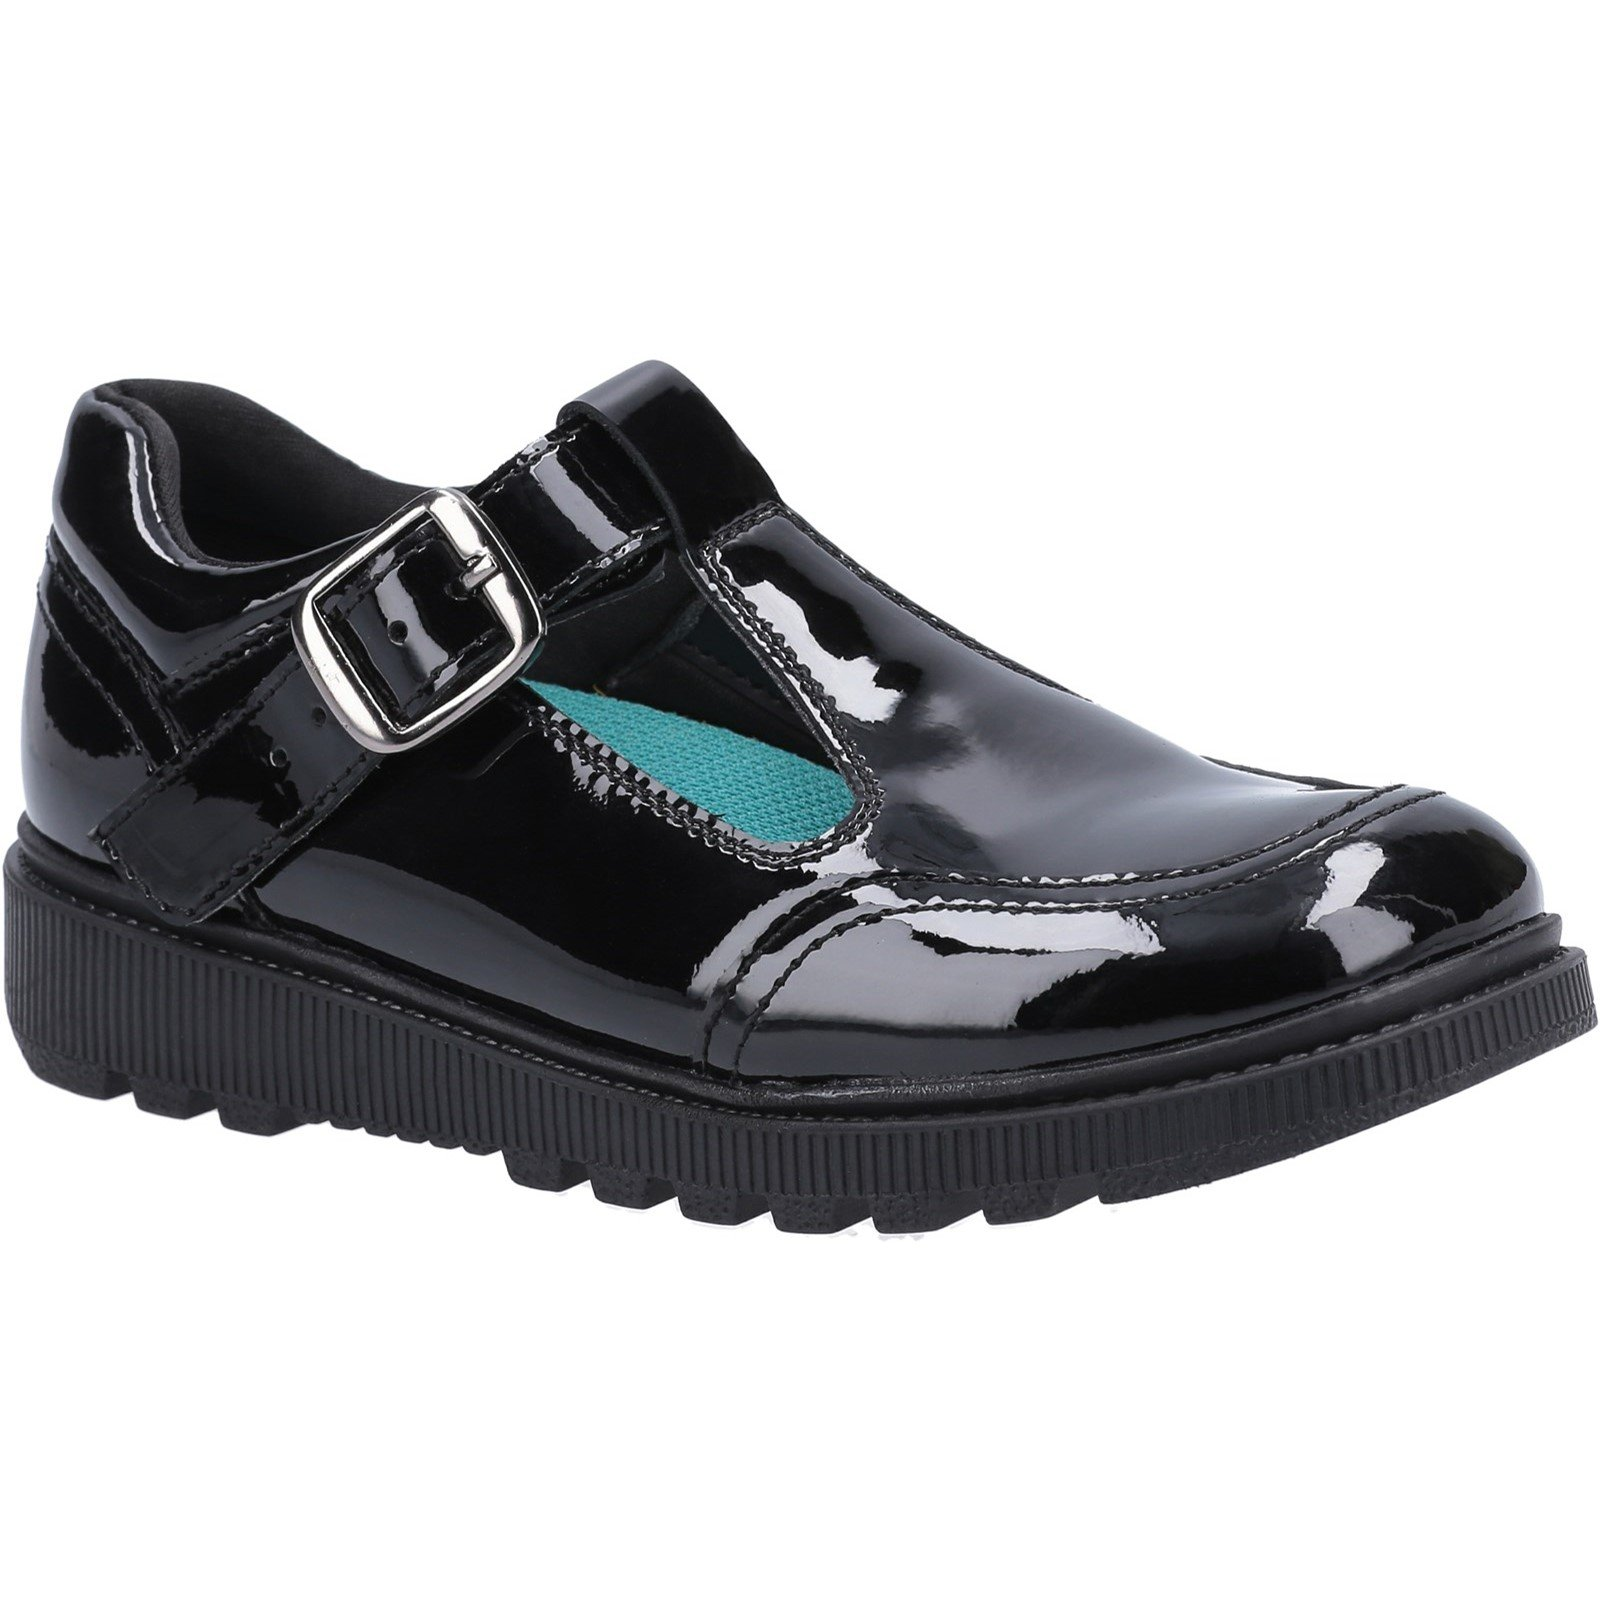 Hush Puppies Kid's Kerry Senior School Shoe Patent Black 30820 - Patent Black 7